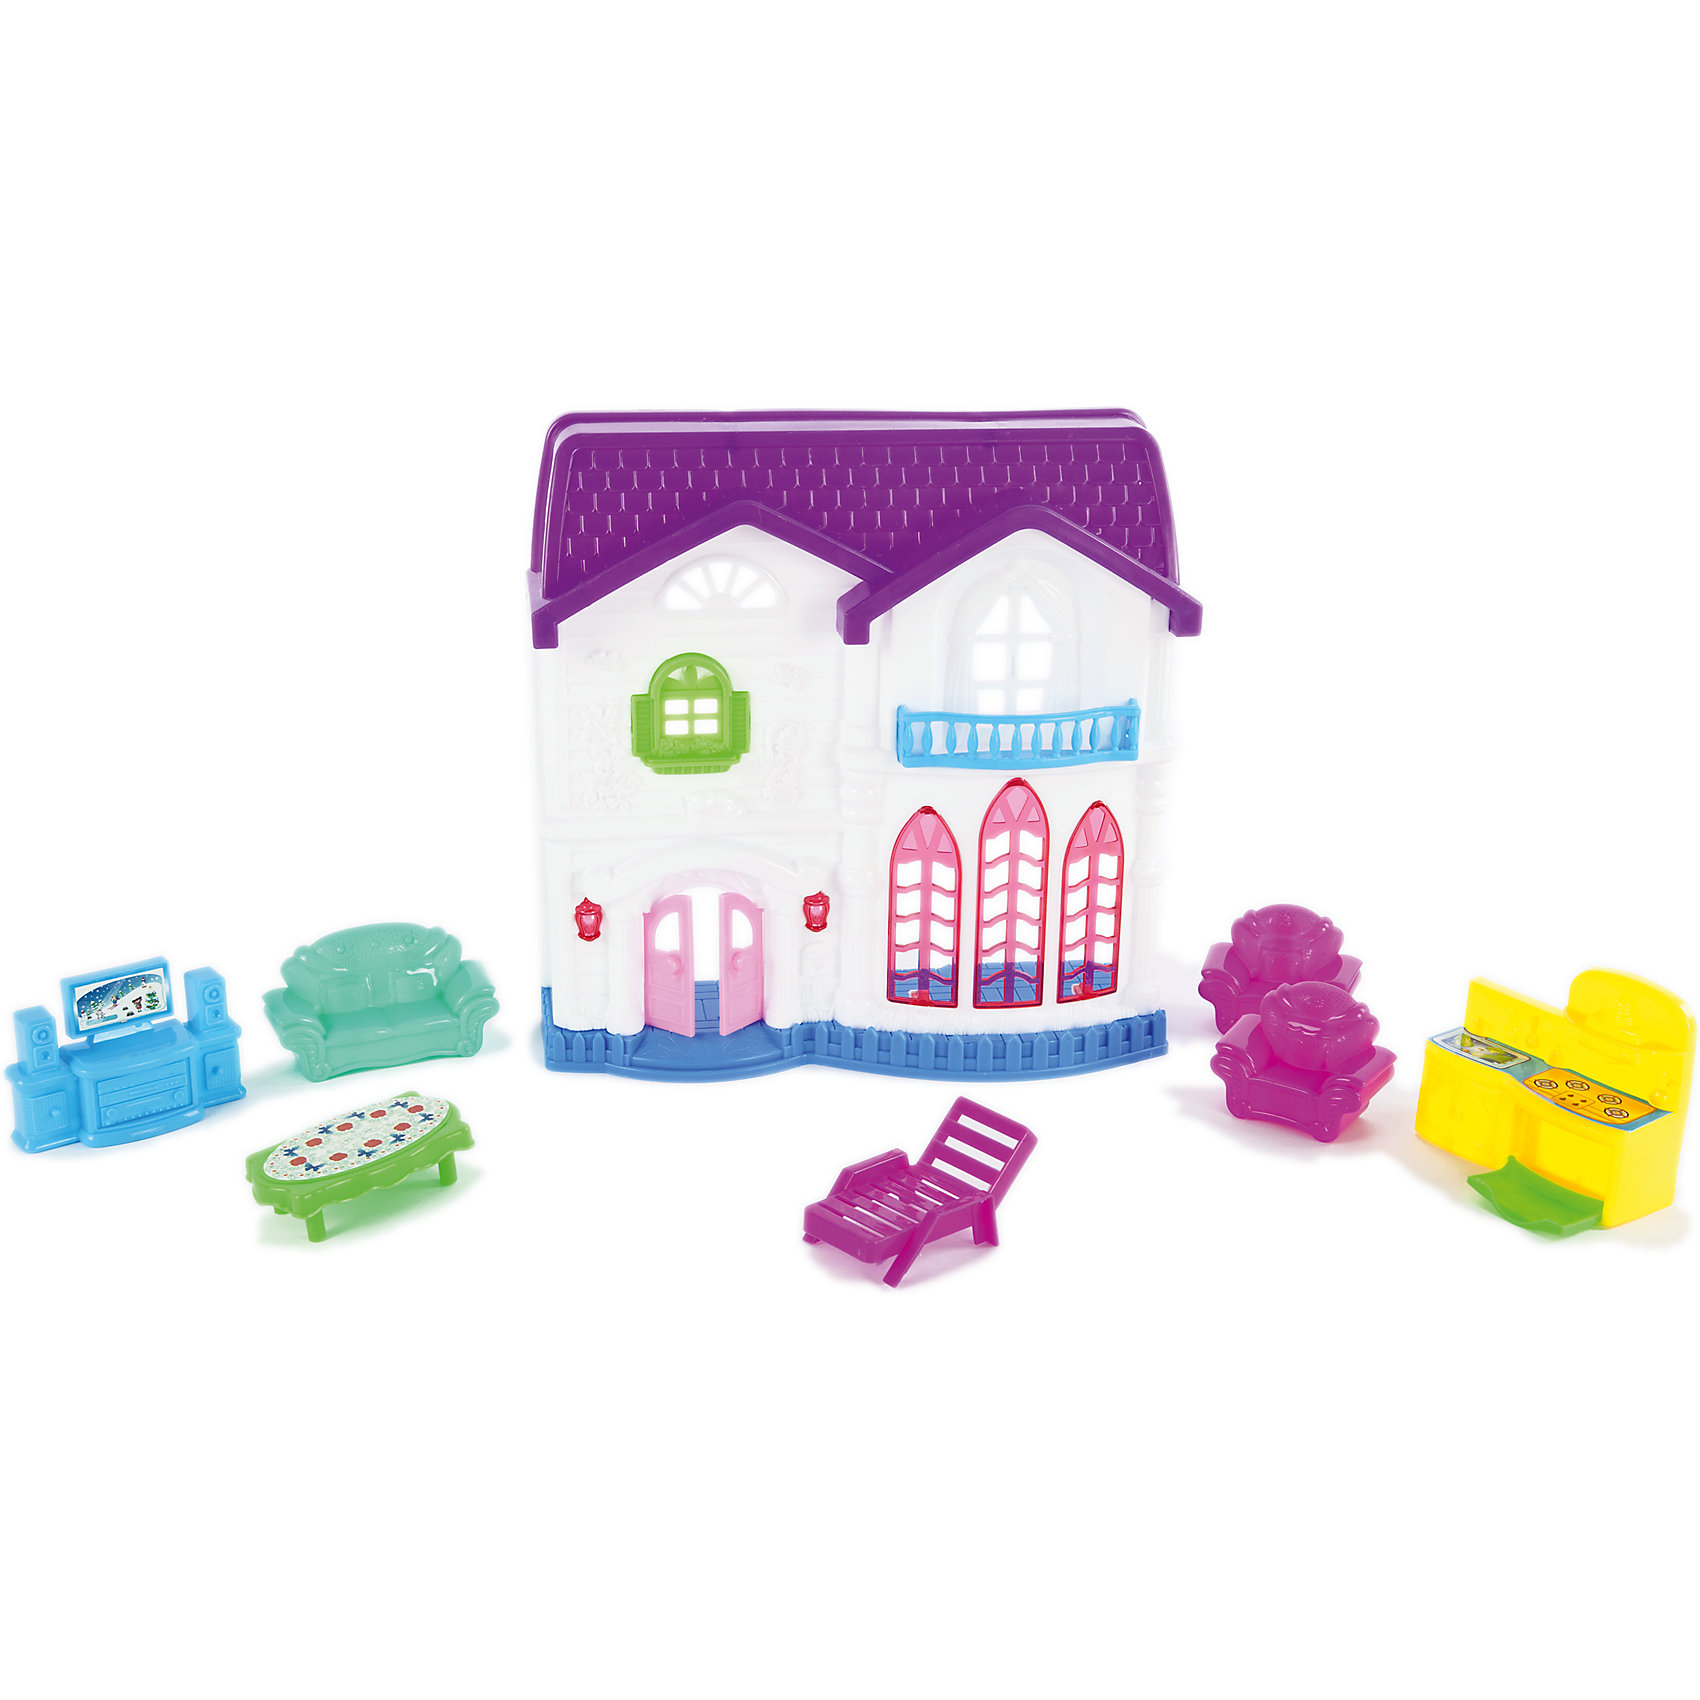 Shantou Gepai Дом для куклы складной, Shantou Gepai shantou gepai игрушка пластм дом для куклы shantou gepai 6927713727717